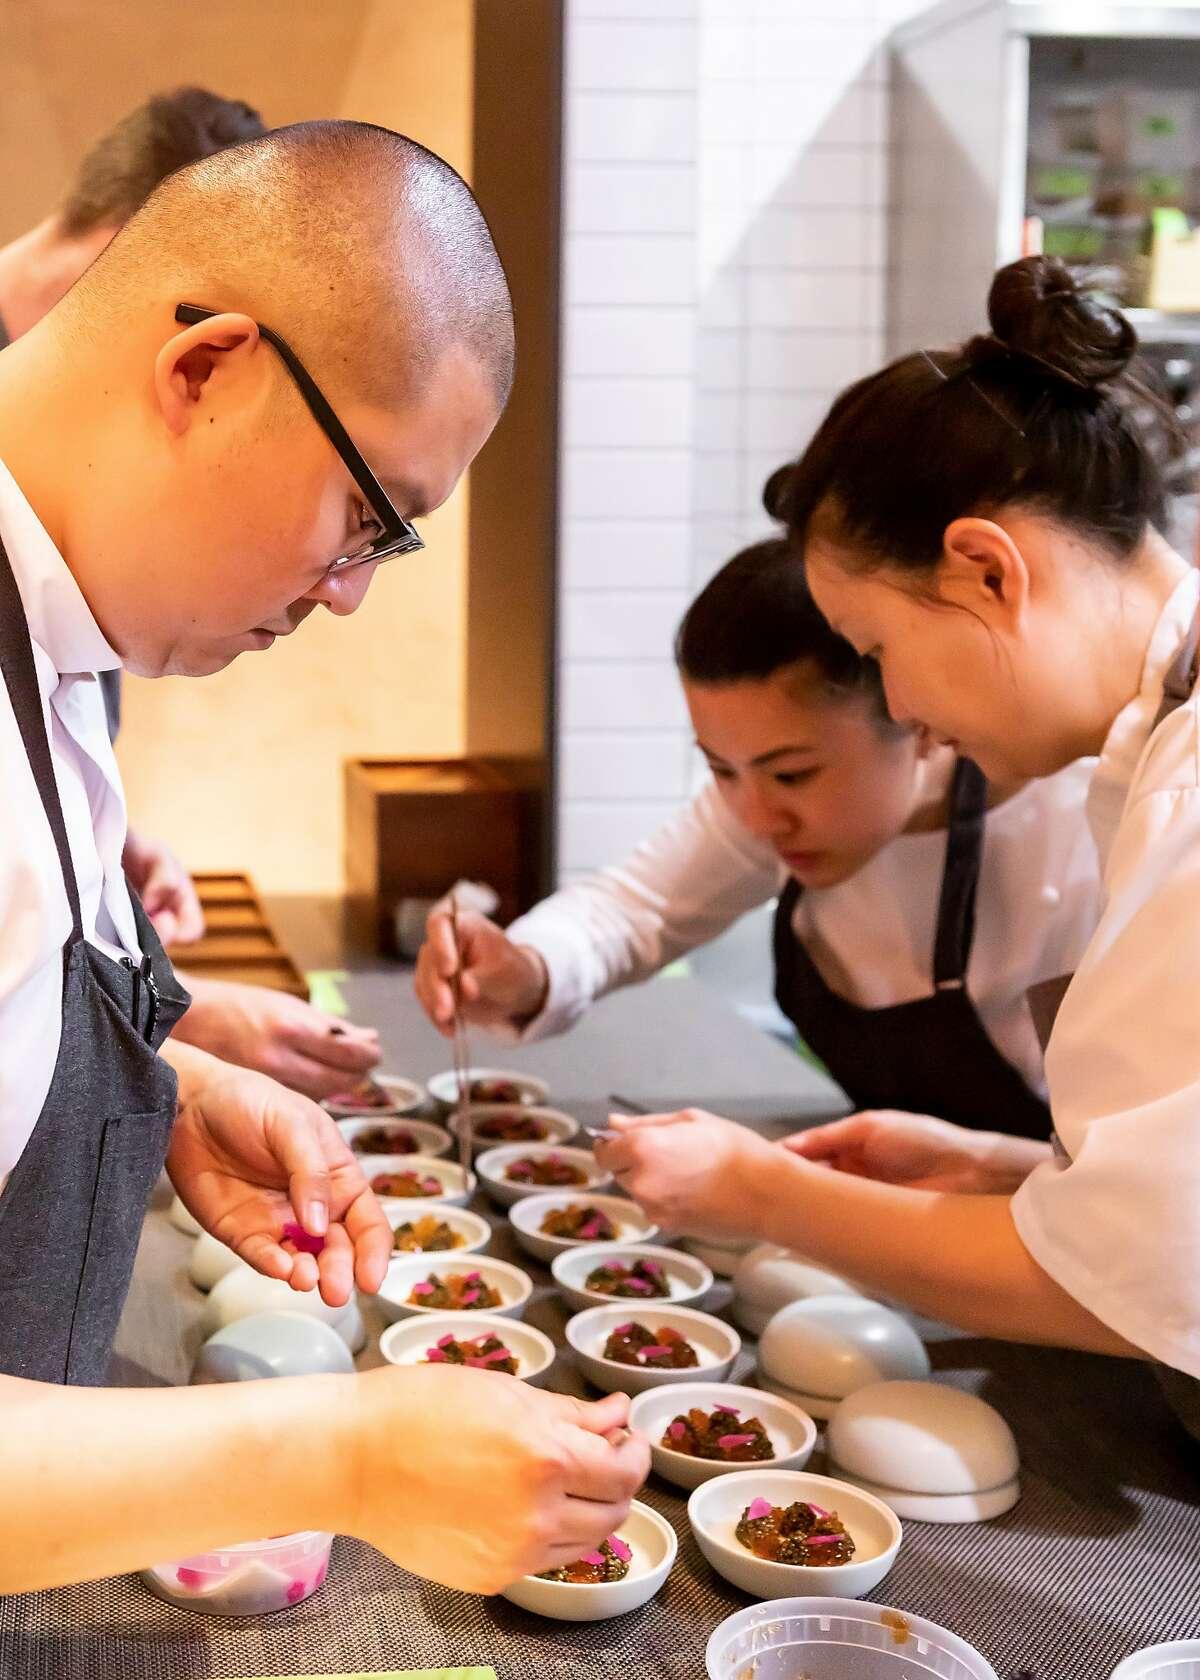 Chefs prepare courses at Maum in Palo Alto, Calif. on Friday, April 26, 2019.